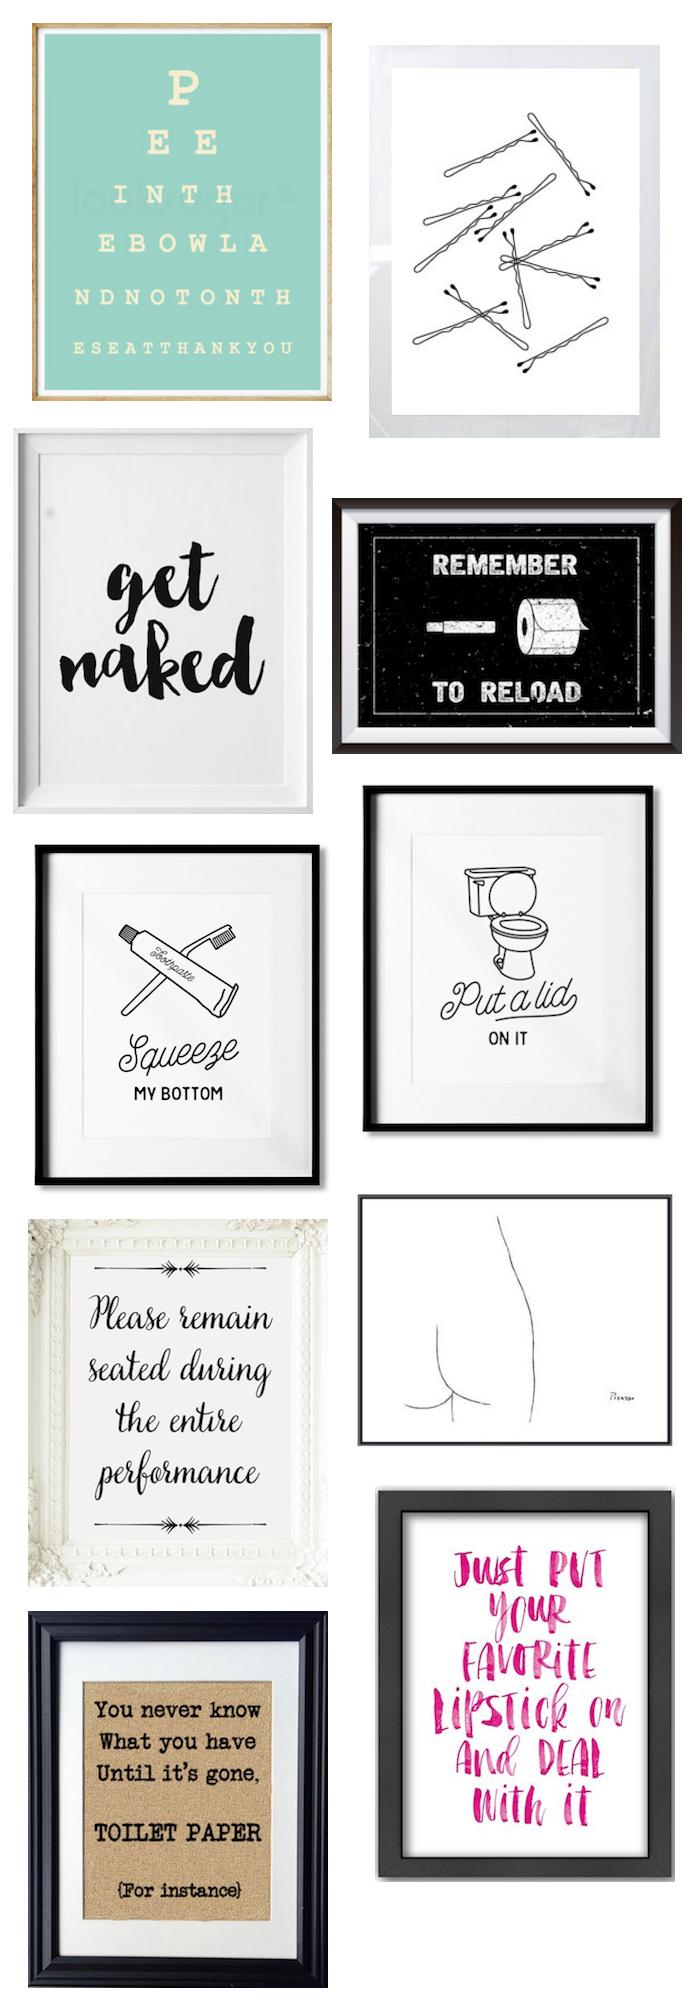 10 Funny Yet Cly Bathroom Prints